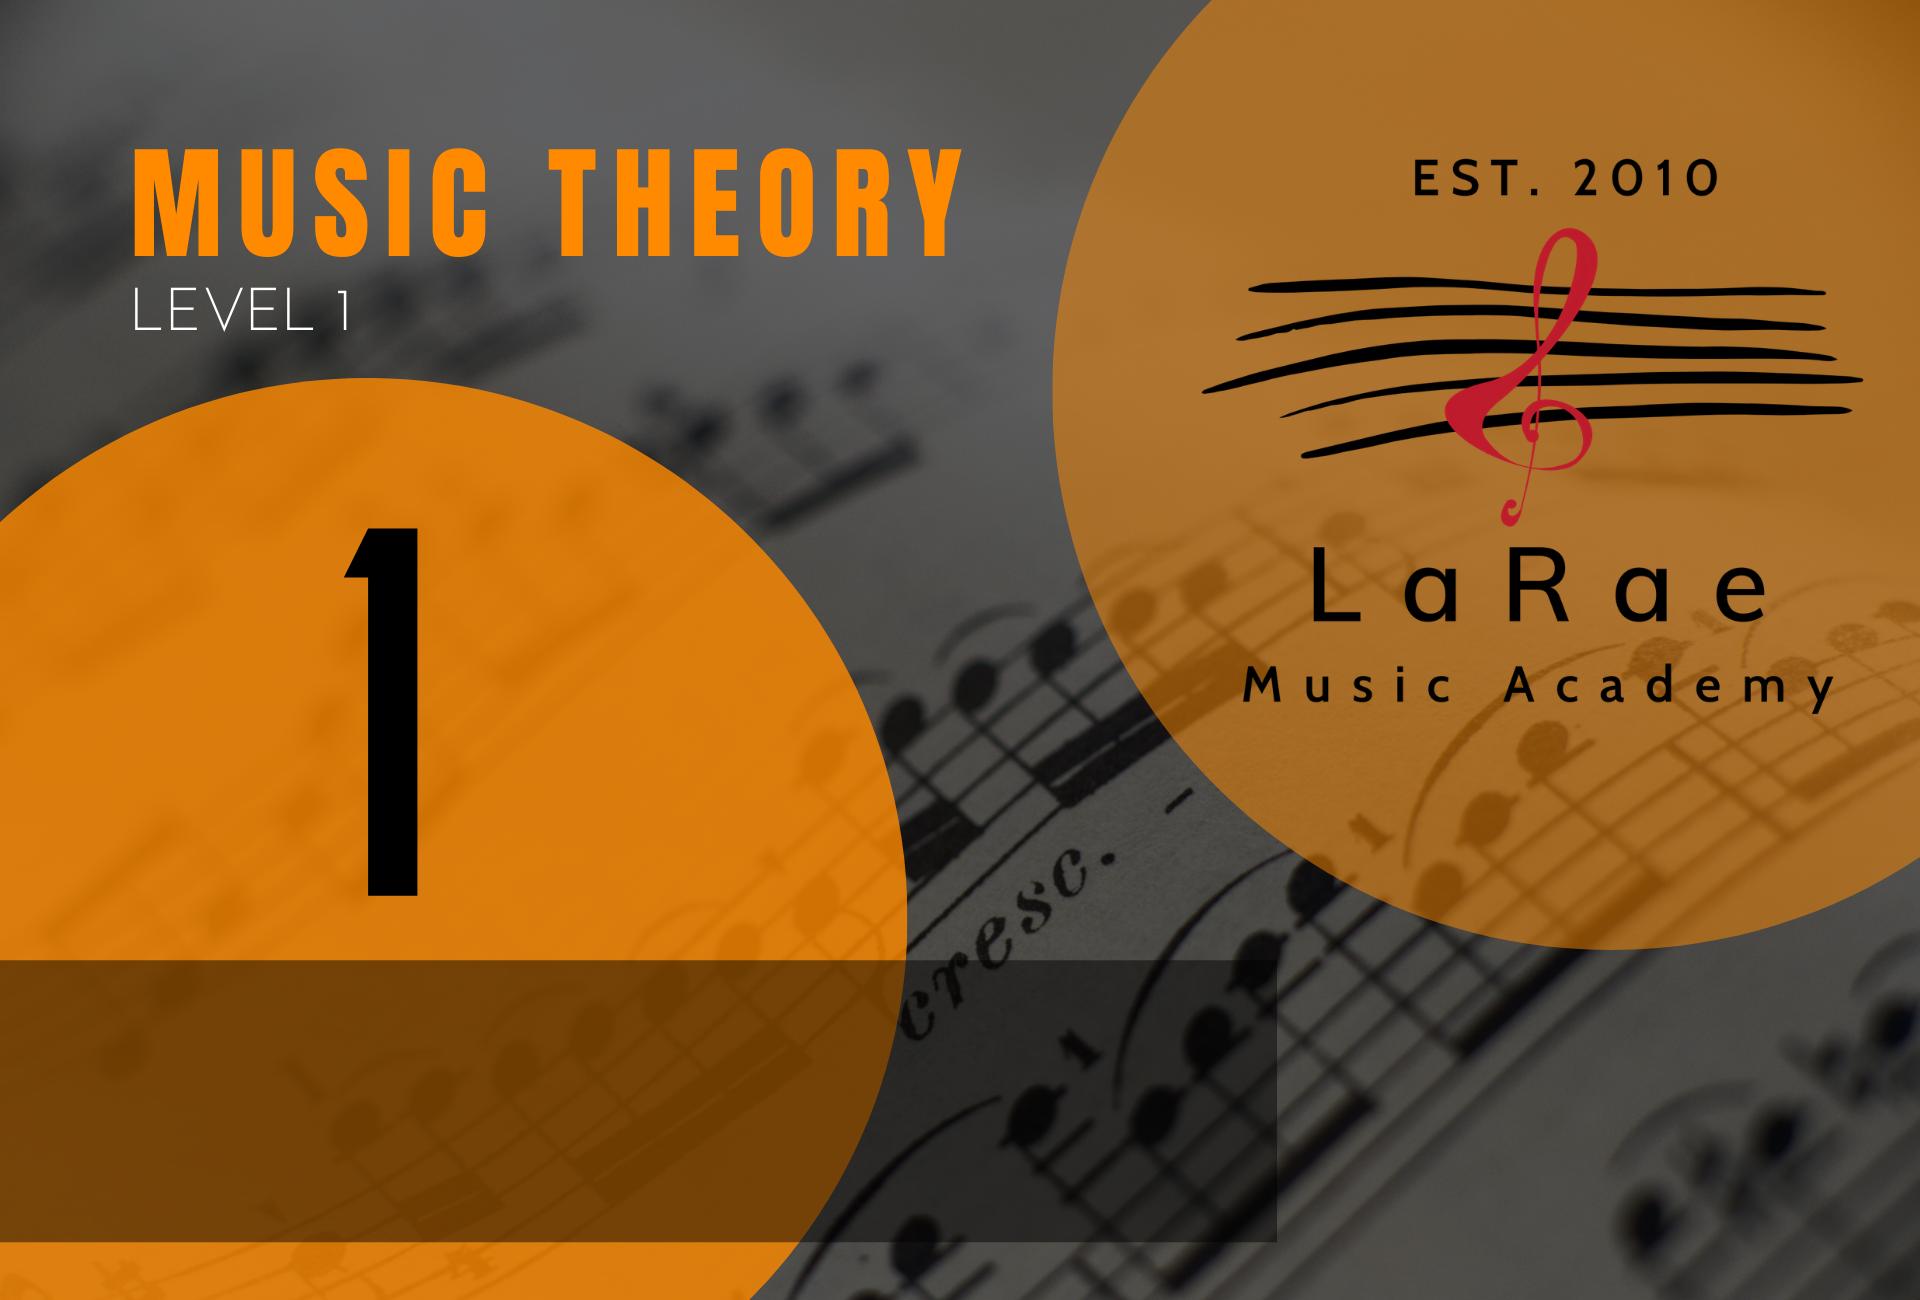 Music Theory Level 1